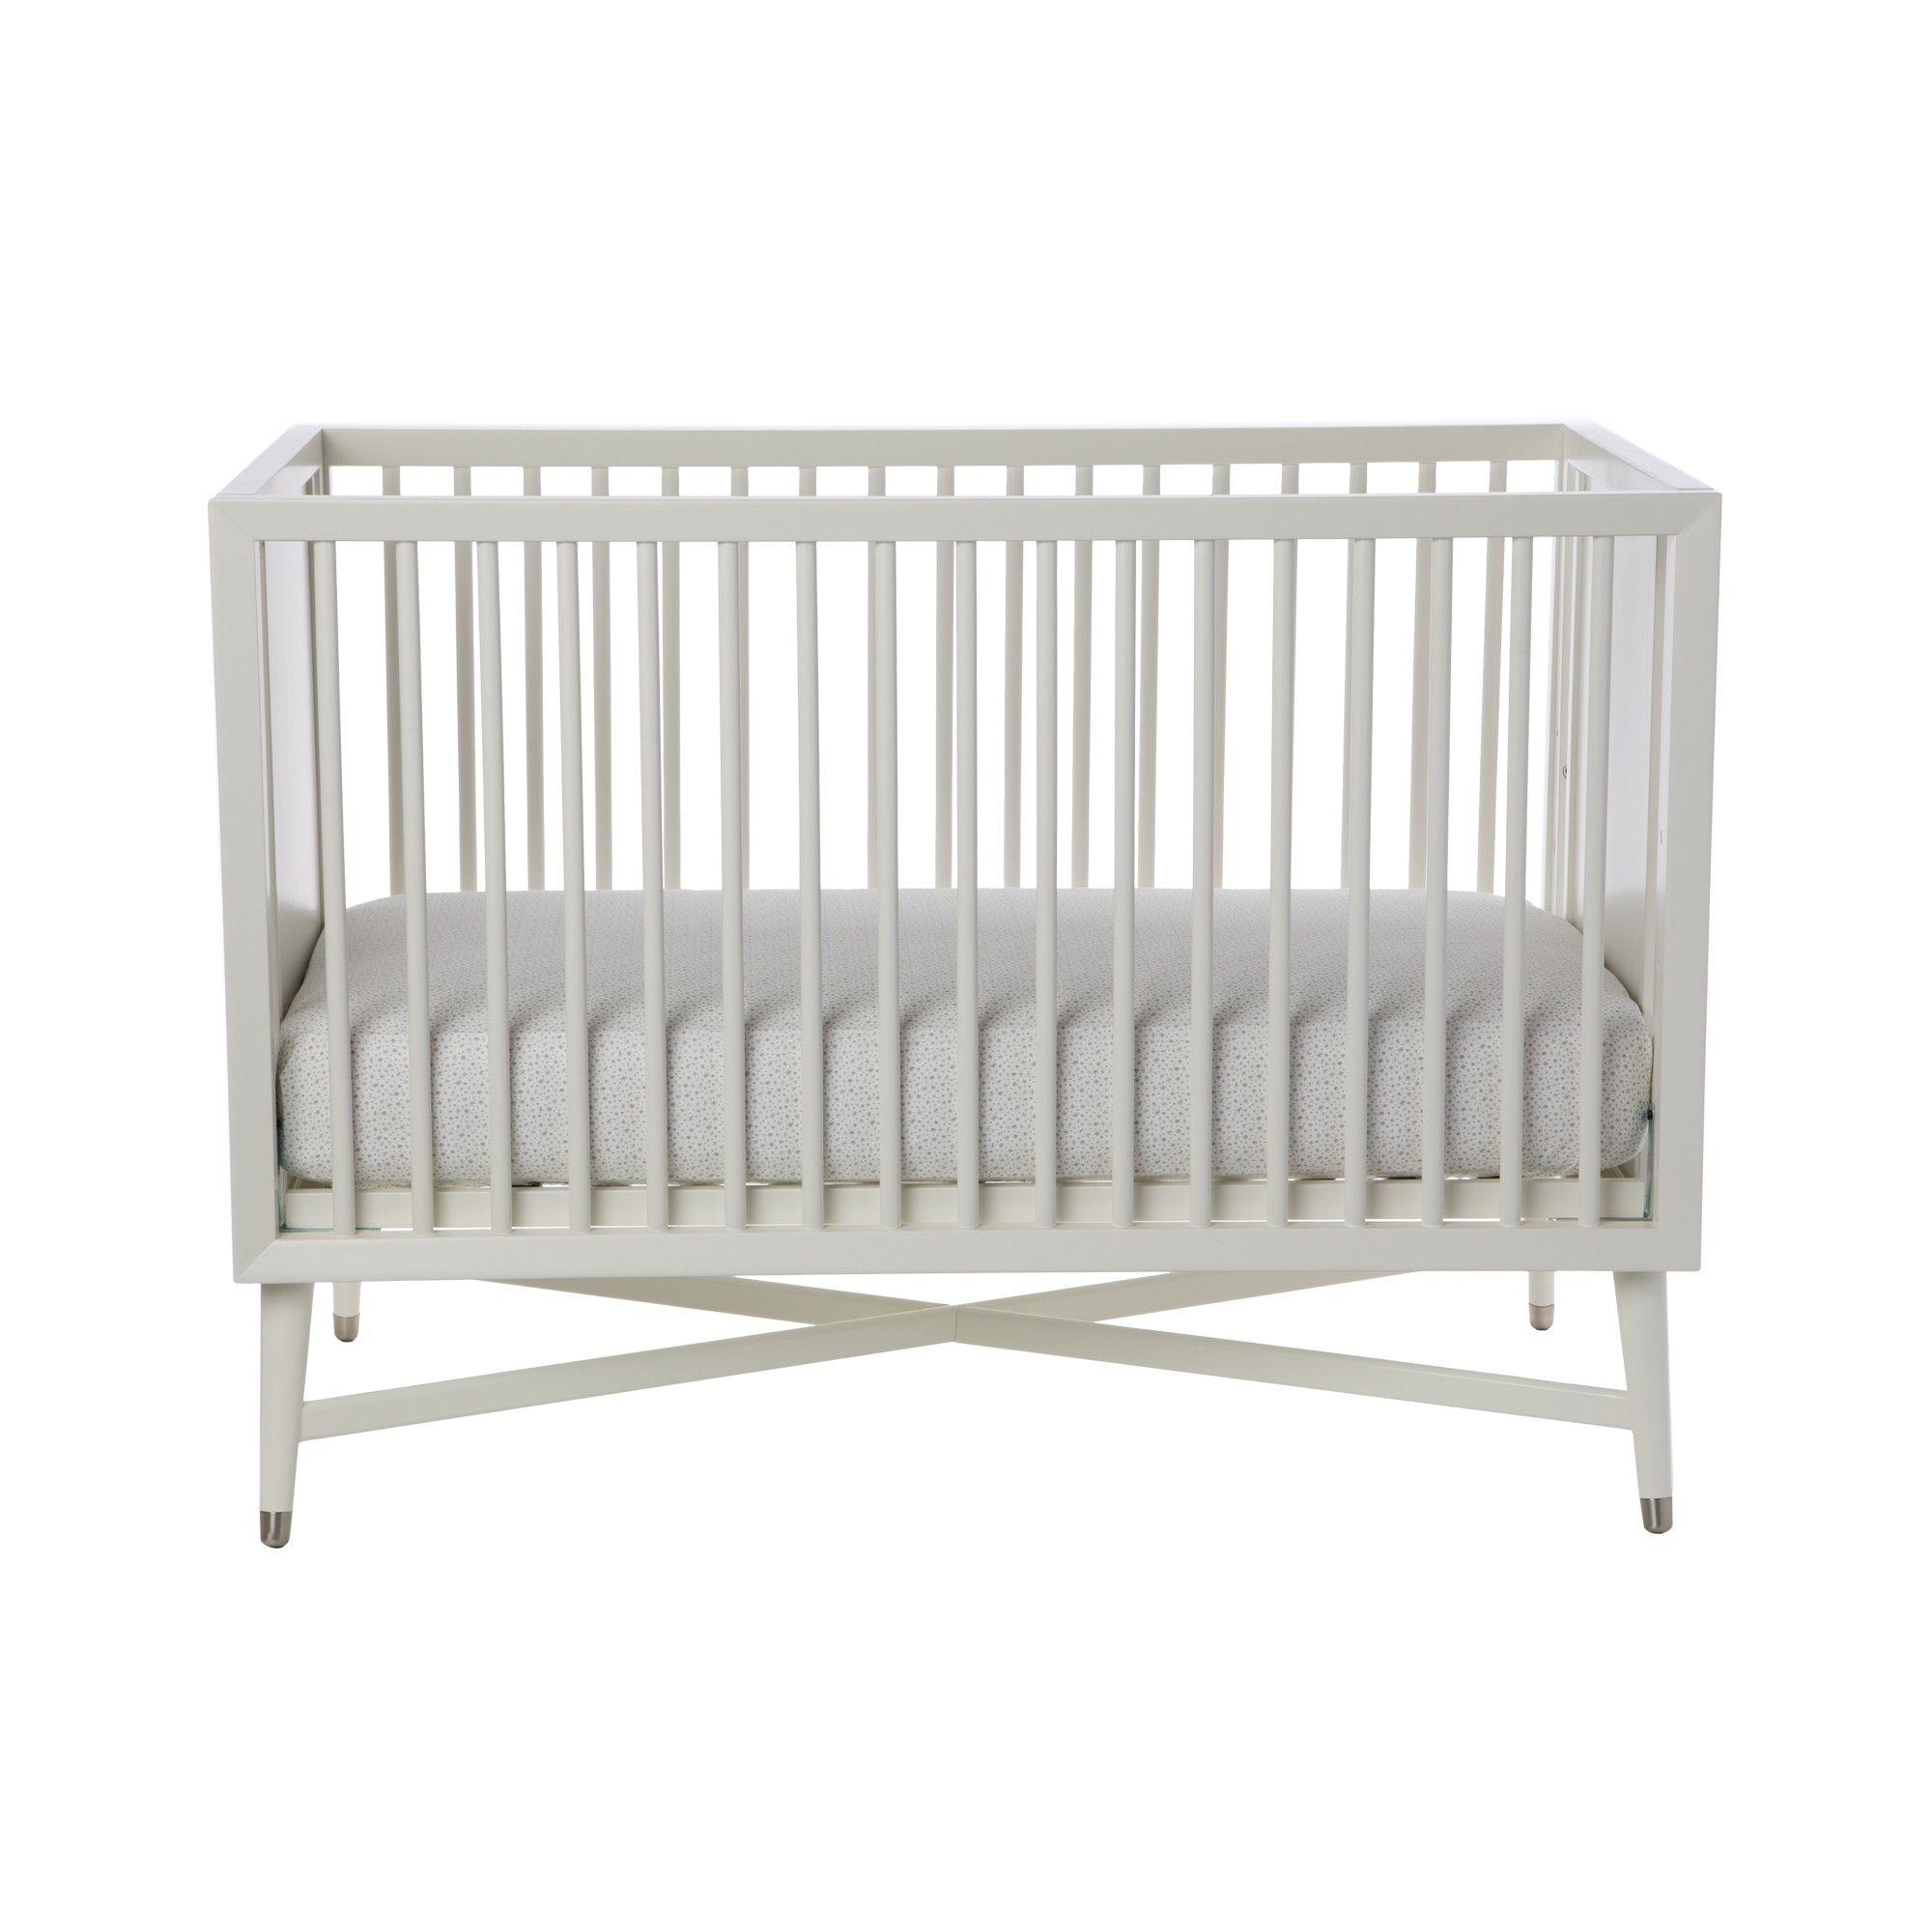 Dwellstudio Mid Century Crib Cribs White Crib Dwell Studio